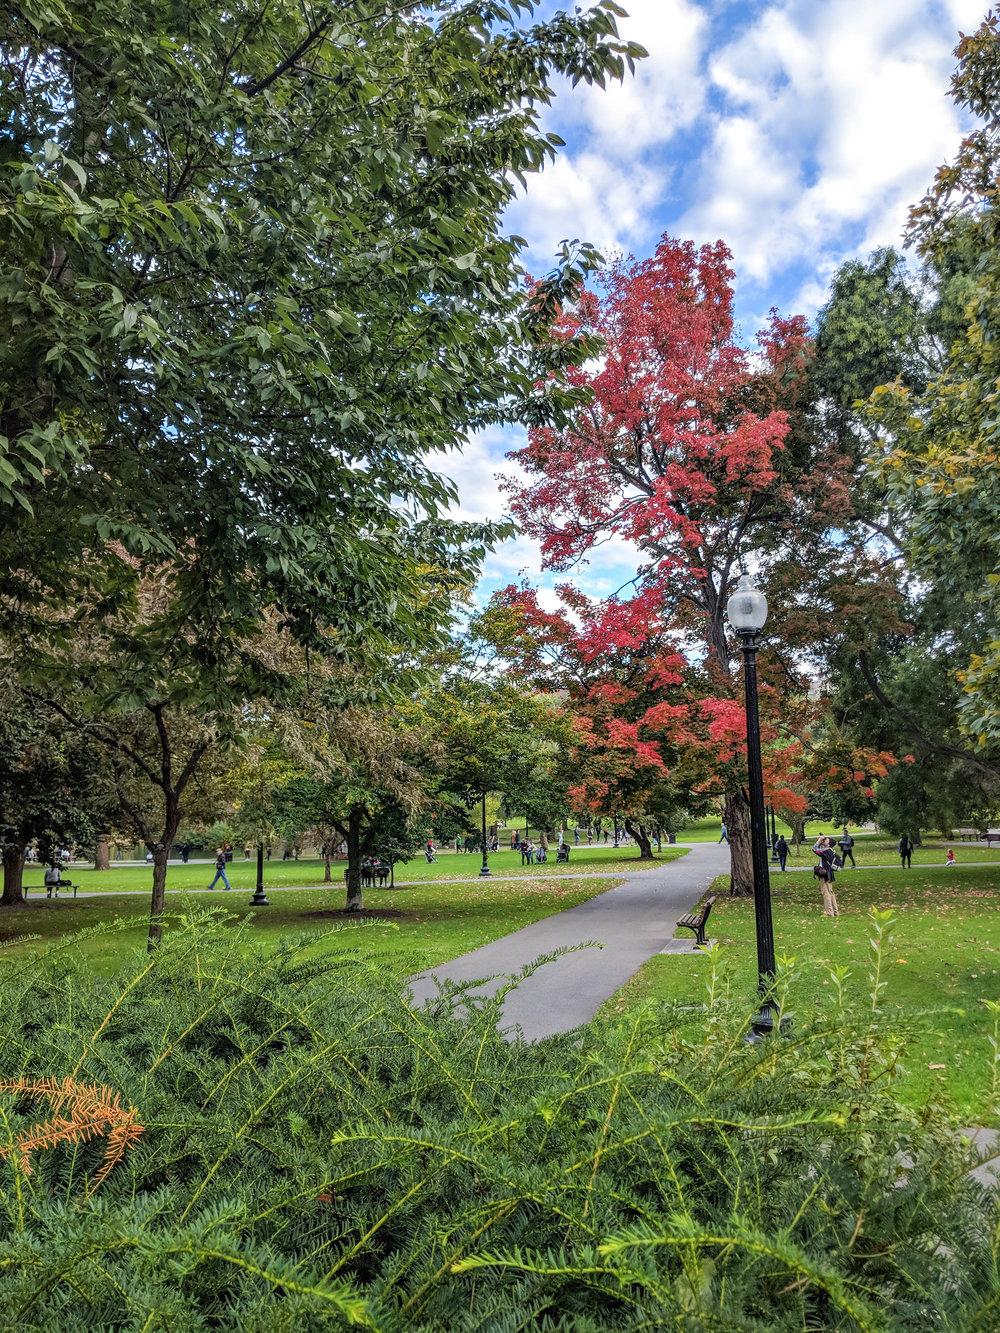 bri rinehart; photography; boston; boston public garden